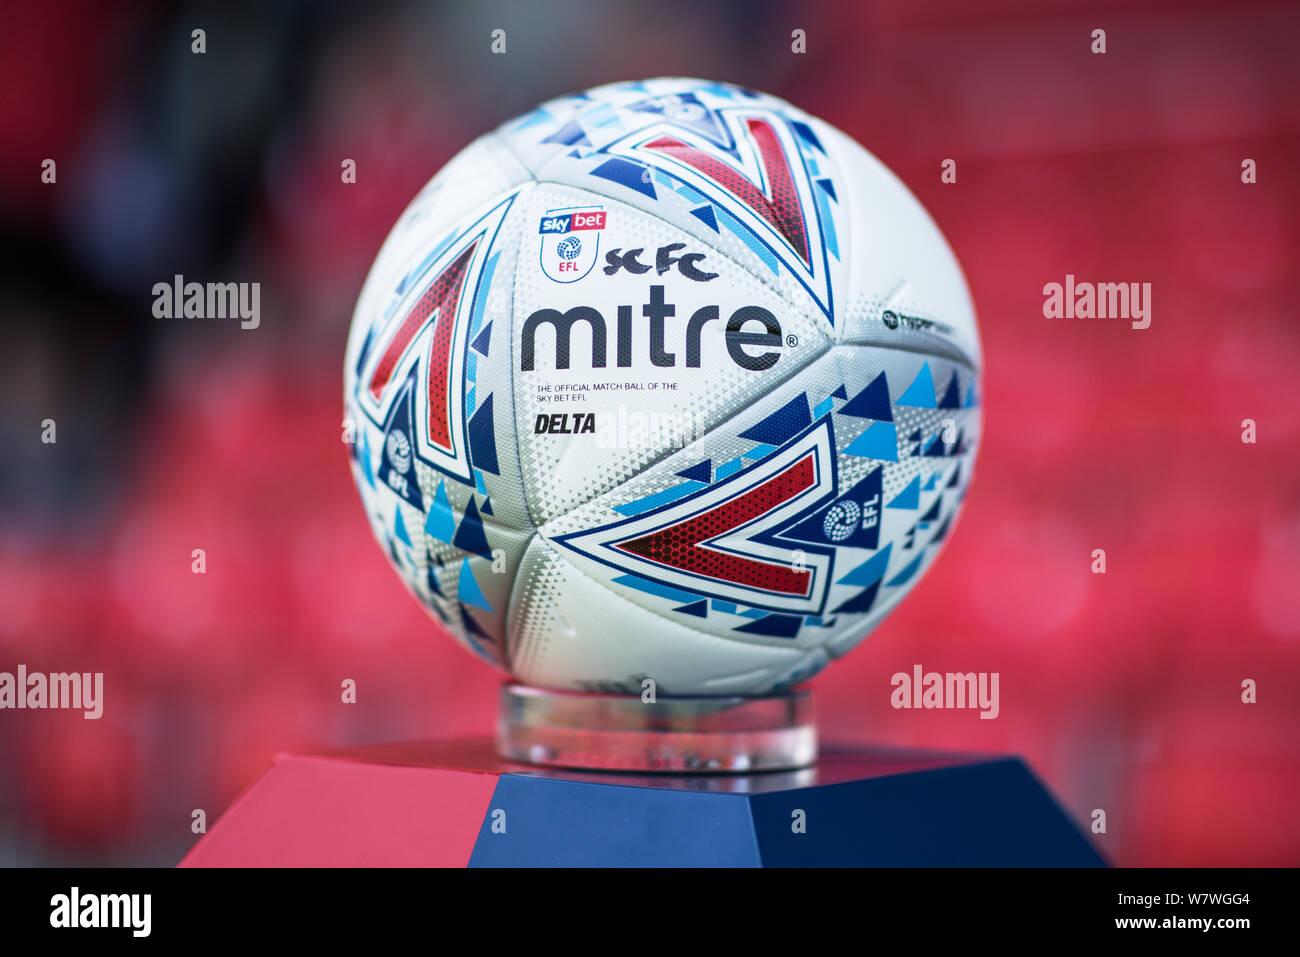 Mitre Delta EFL Official 2019//20 Match Ball